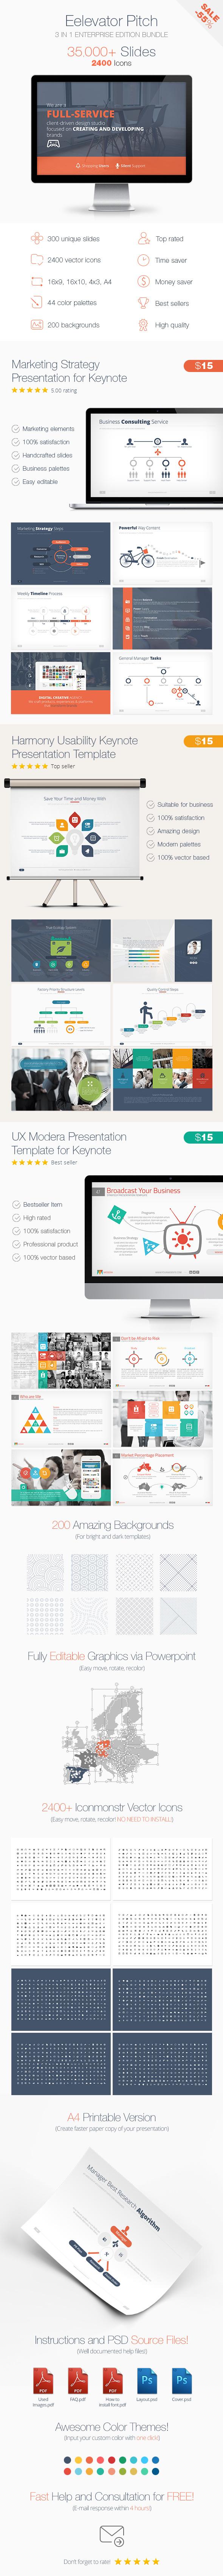 Elevator Pitch Keynote Presentation Bundle  - Business Keynote Templates